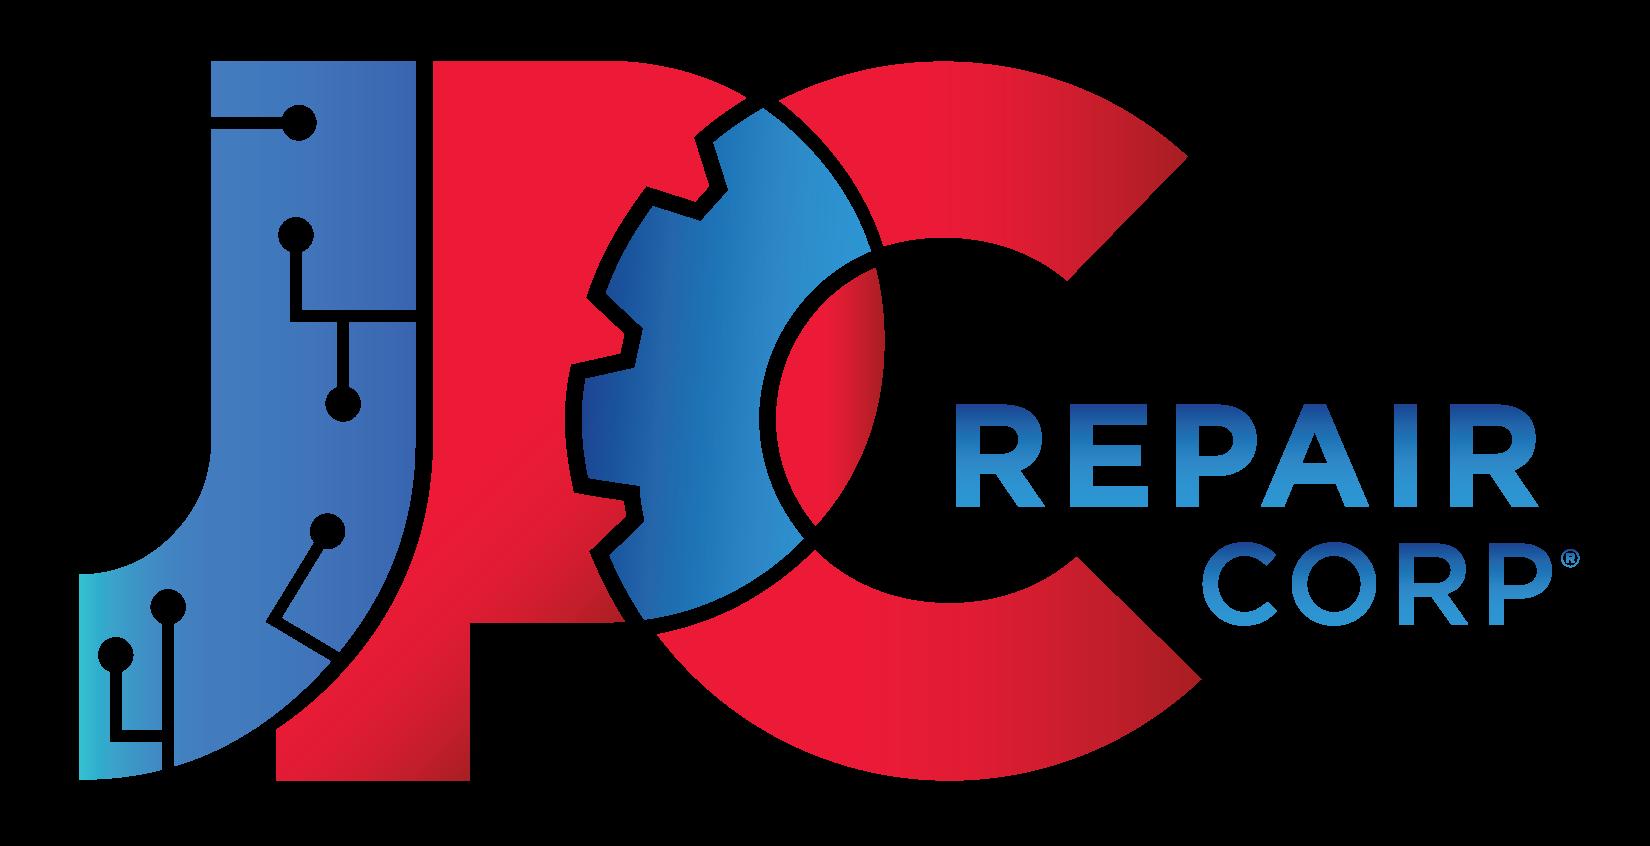 Jpc Repair Corp Logo